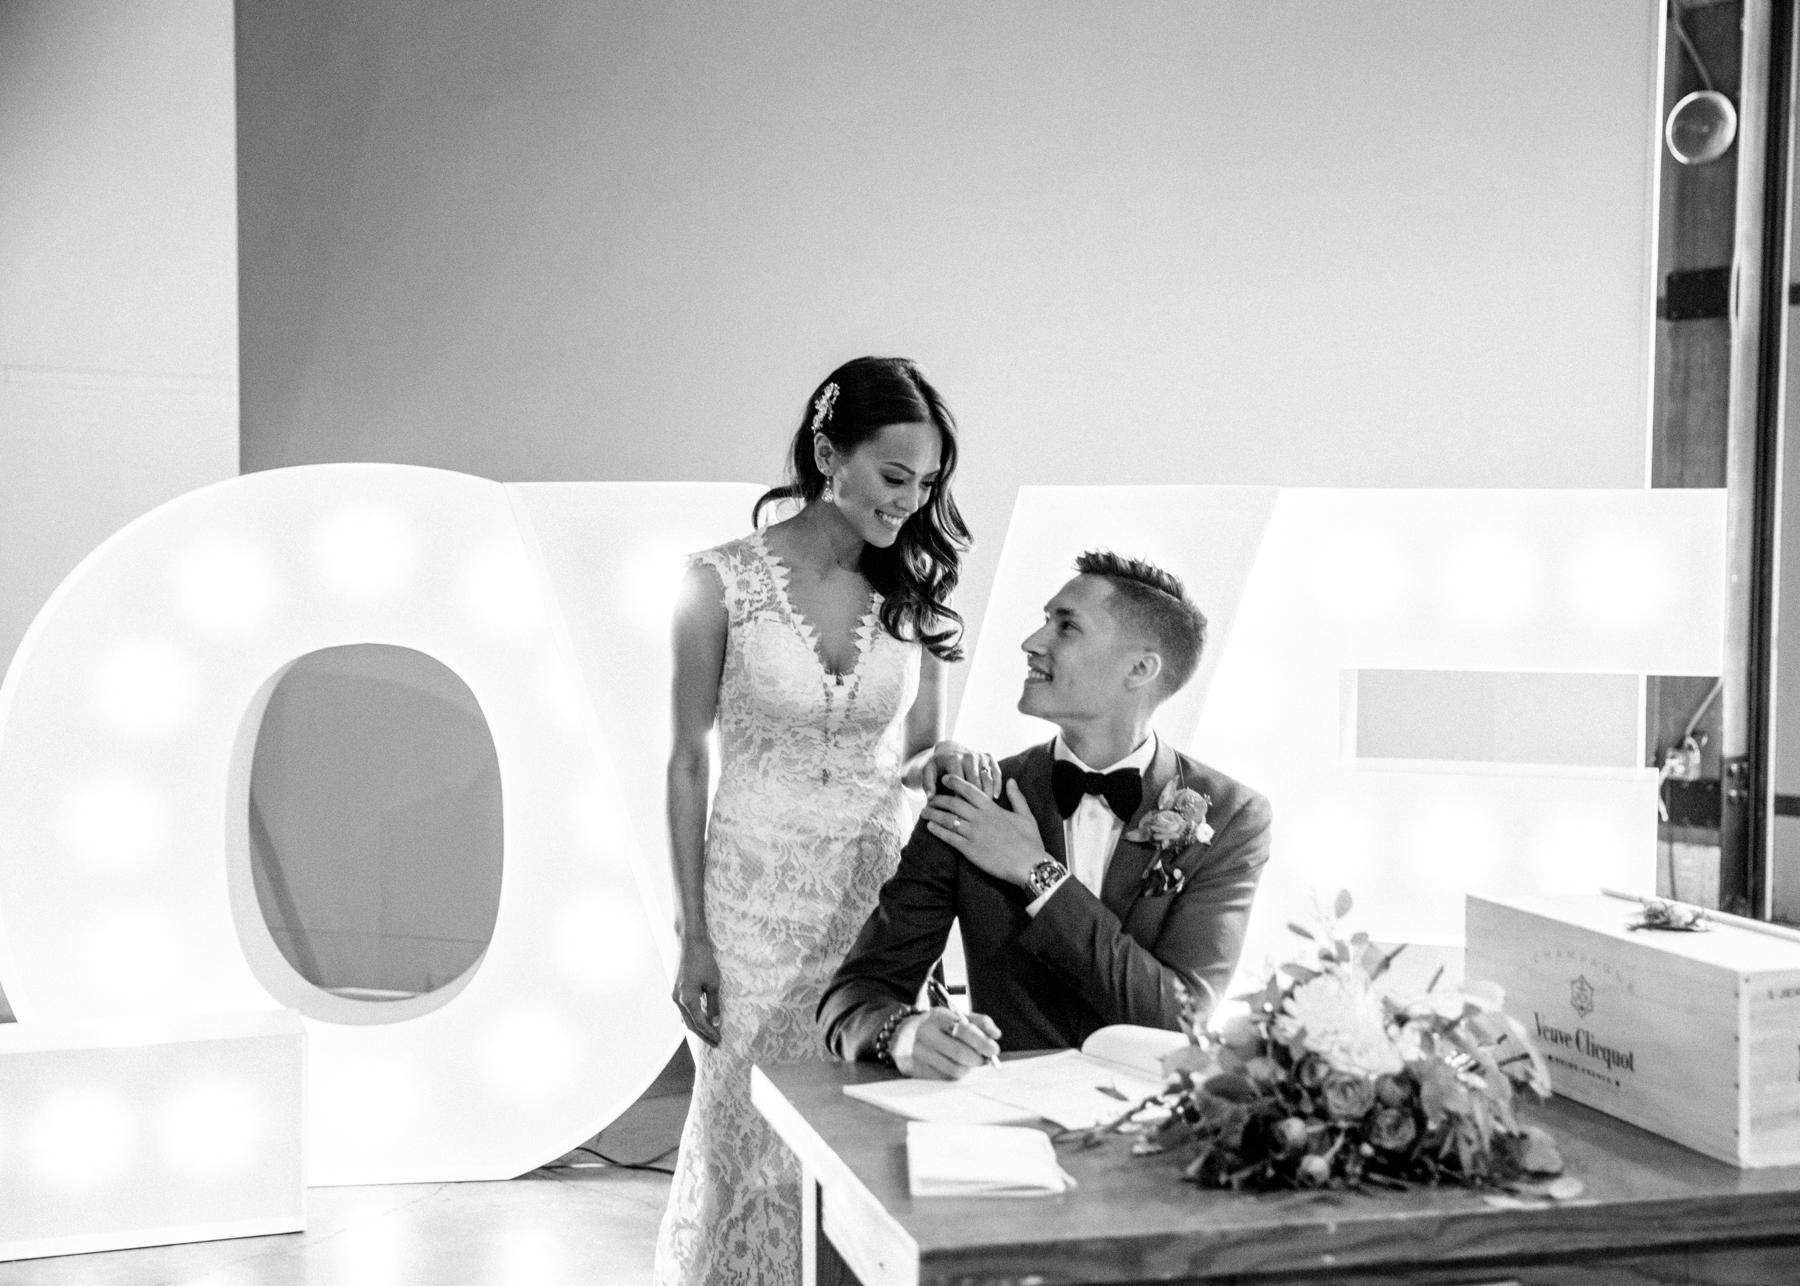 kaoverii_silva_photographer_via-herafilms_kieu_kaz_wedding-14.jpg